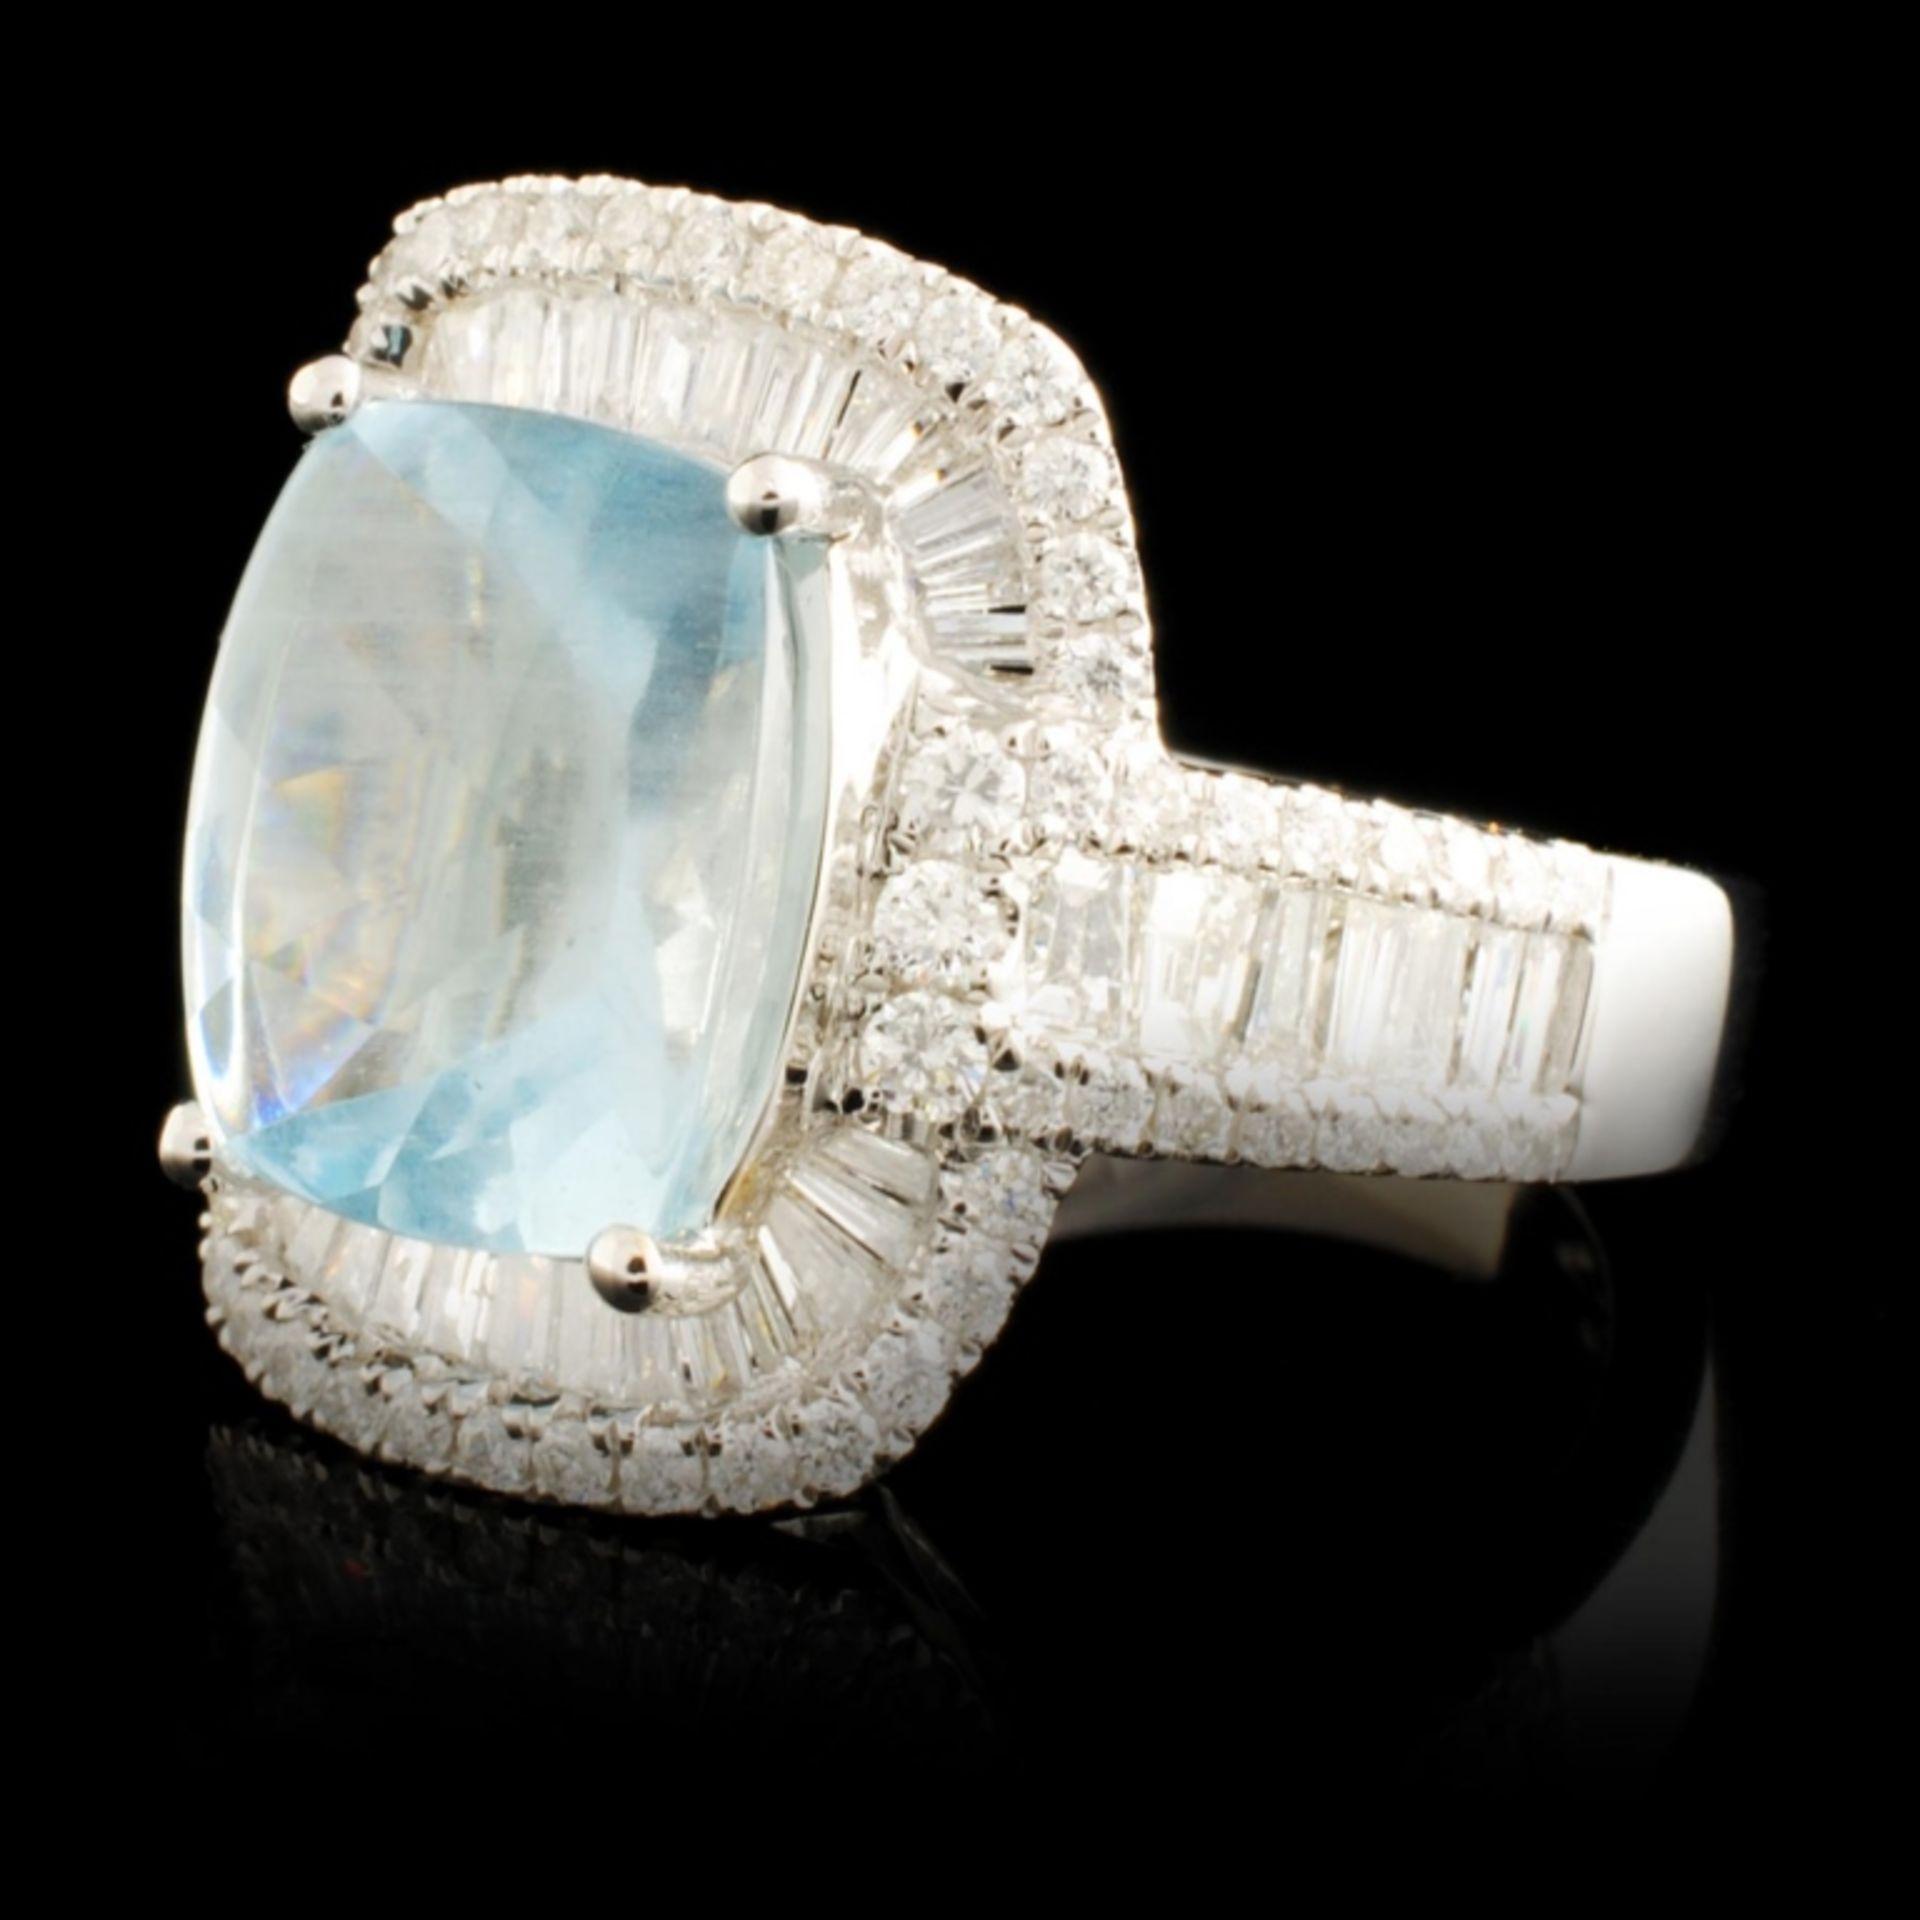 14K Gold 3.43ct Aquamarine & 1.30ctw Diamond Ring - Image 2 of 5